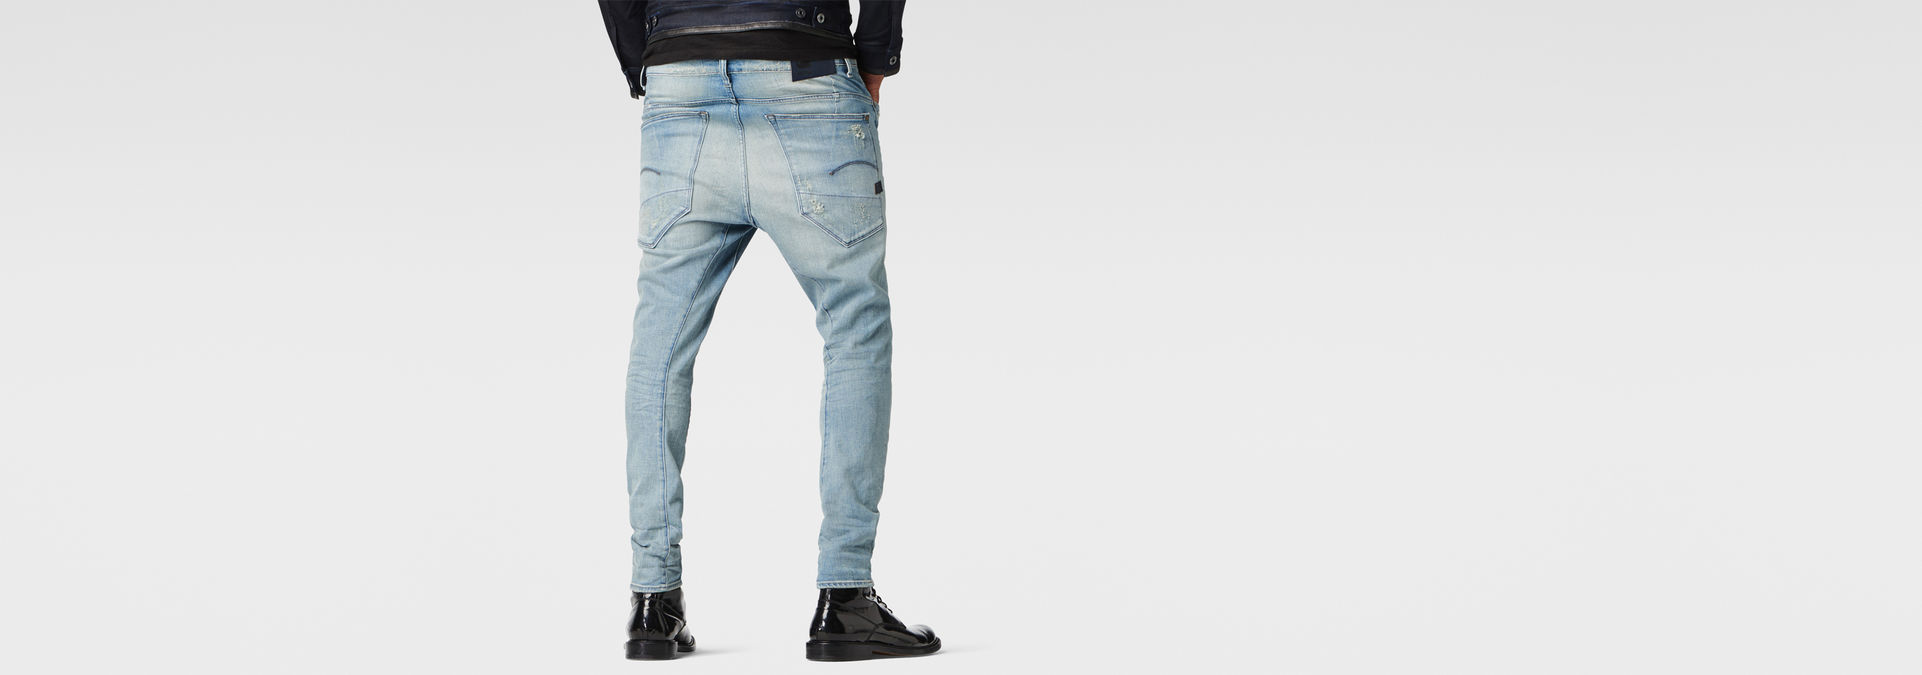 JEANS  G-STAR TYPE C 3D SUPER SLIM dk aged TAILLE W33 L34  VALEUR 130€